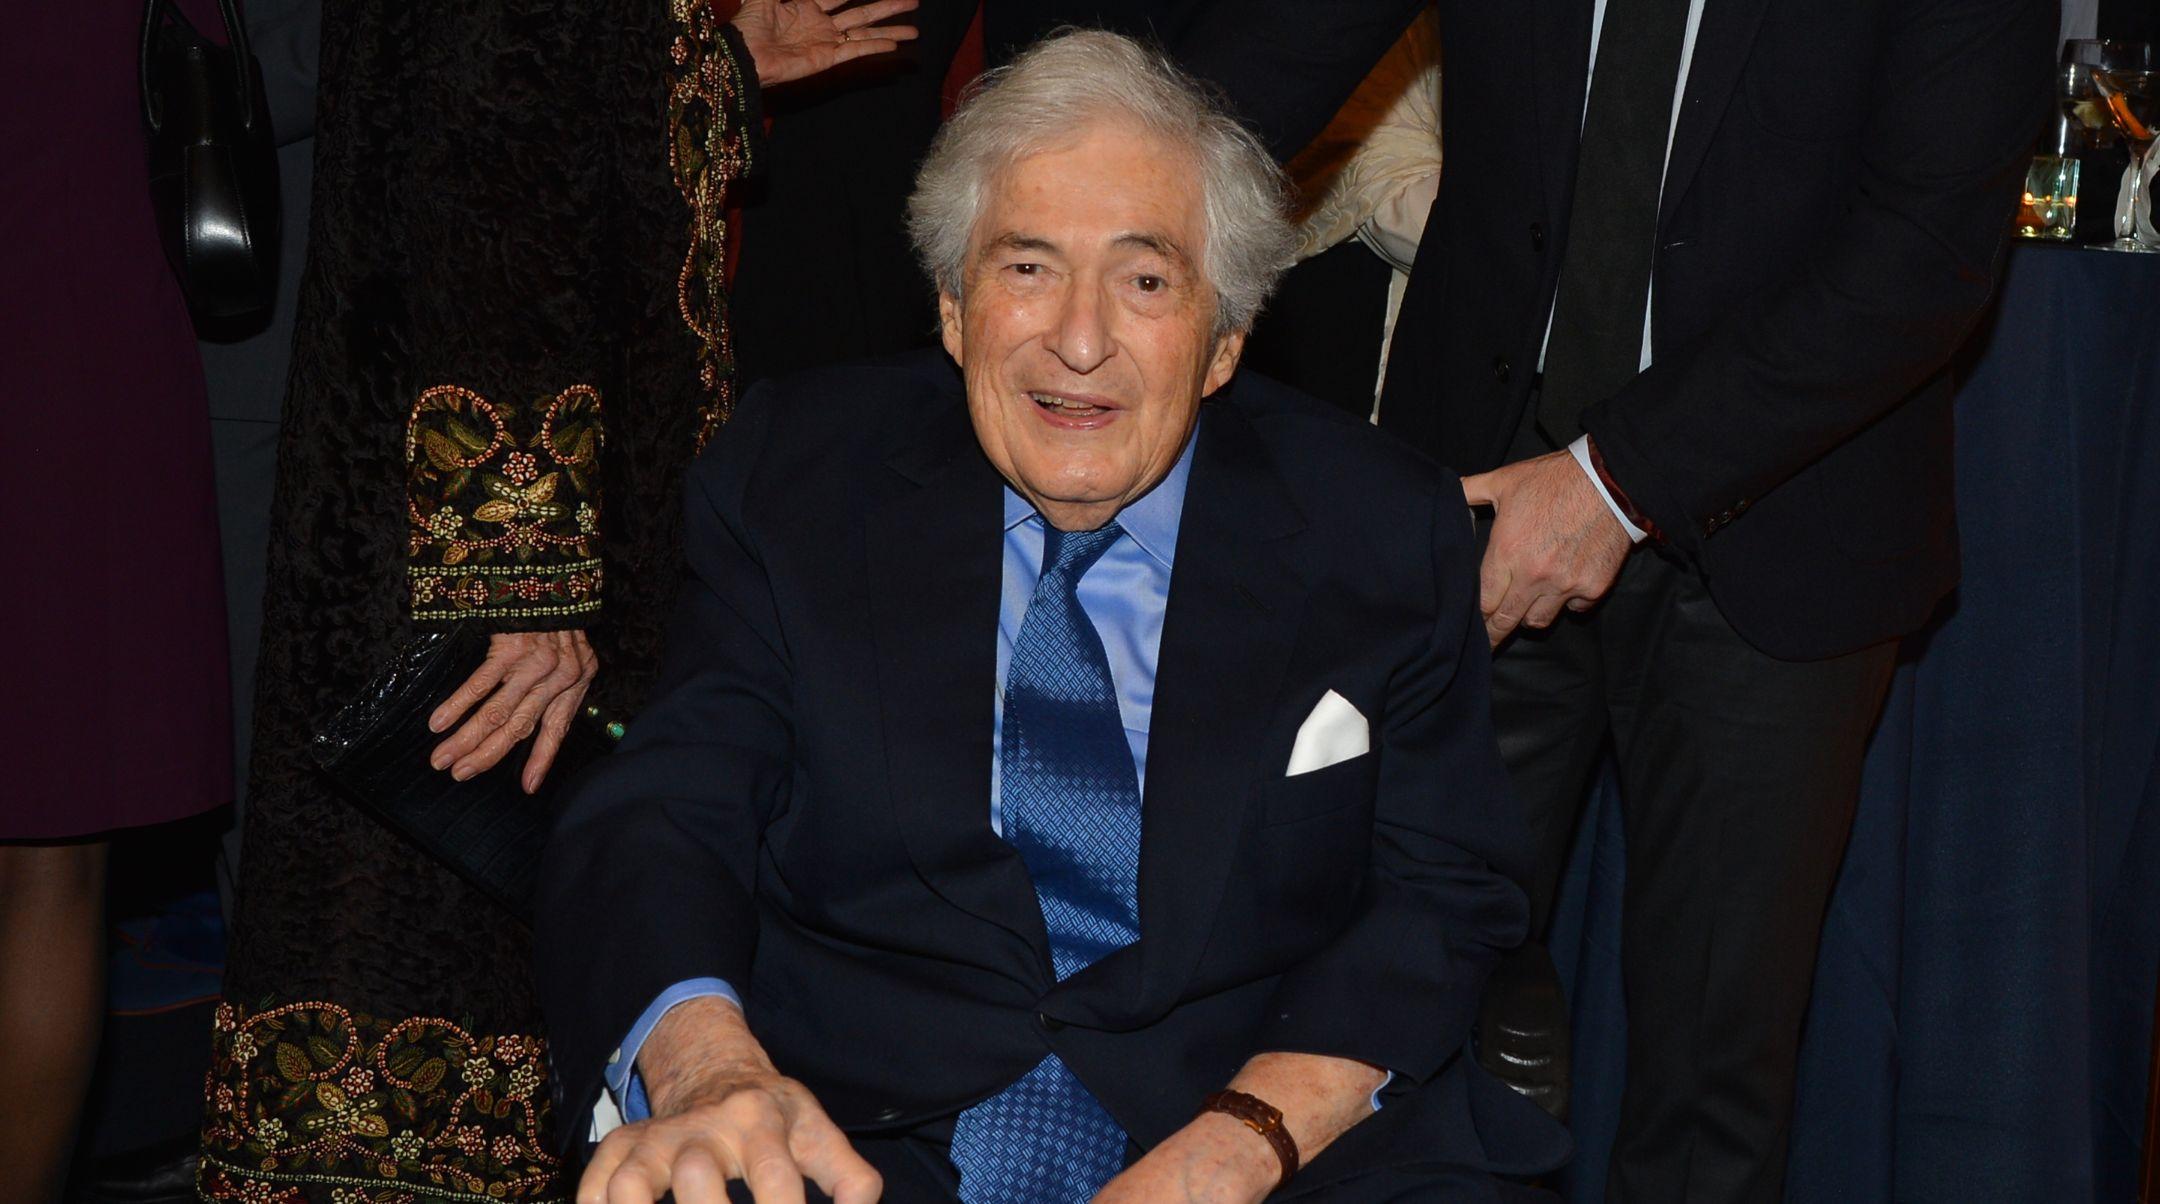 James Wolfensohn, former World Bank president and Jewish philanthropist, dies at 86